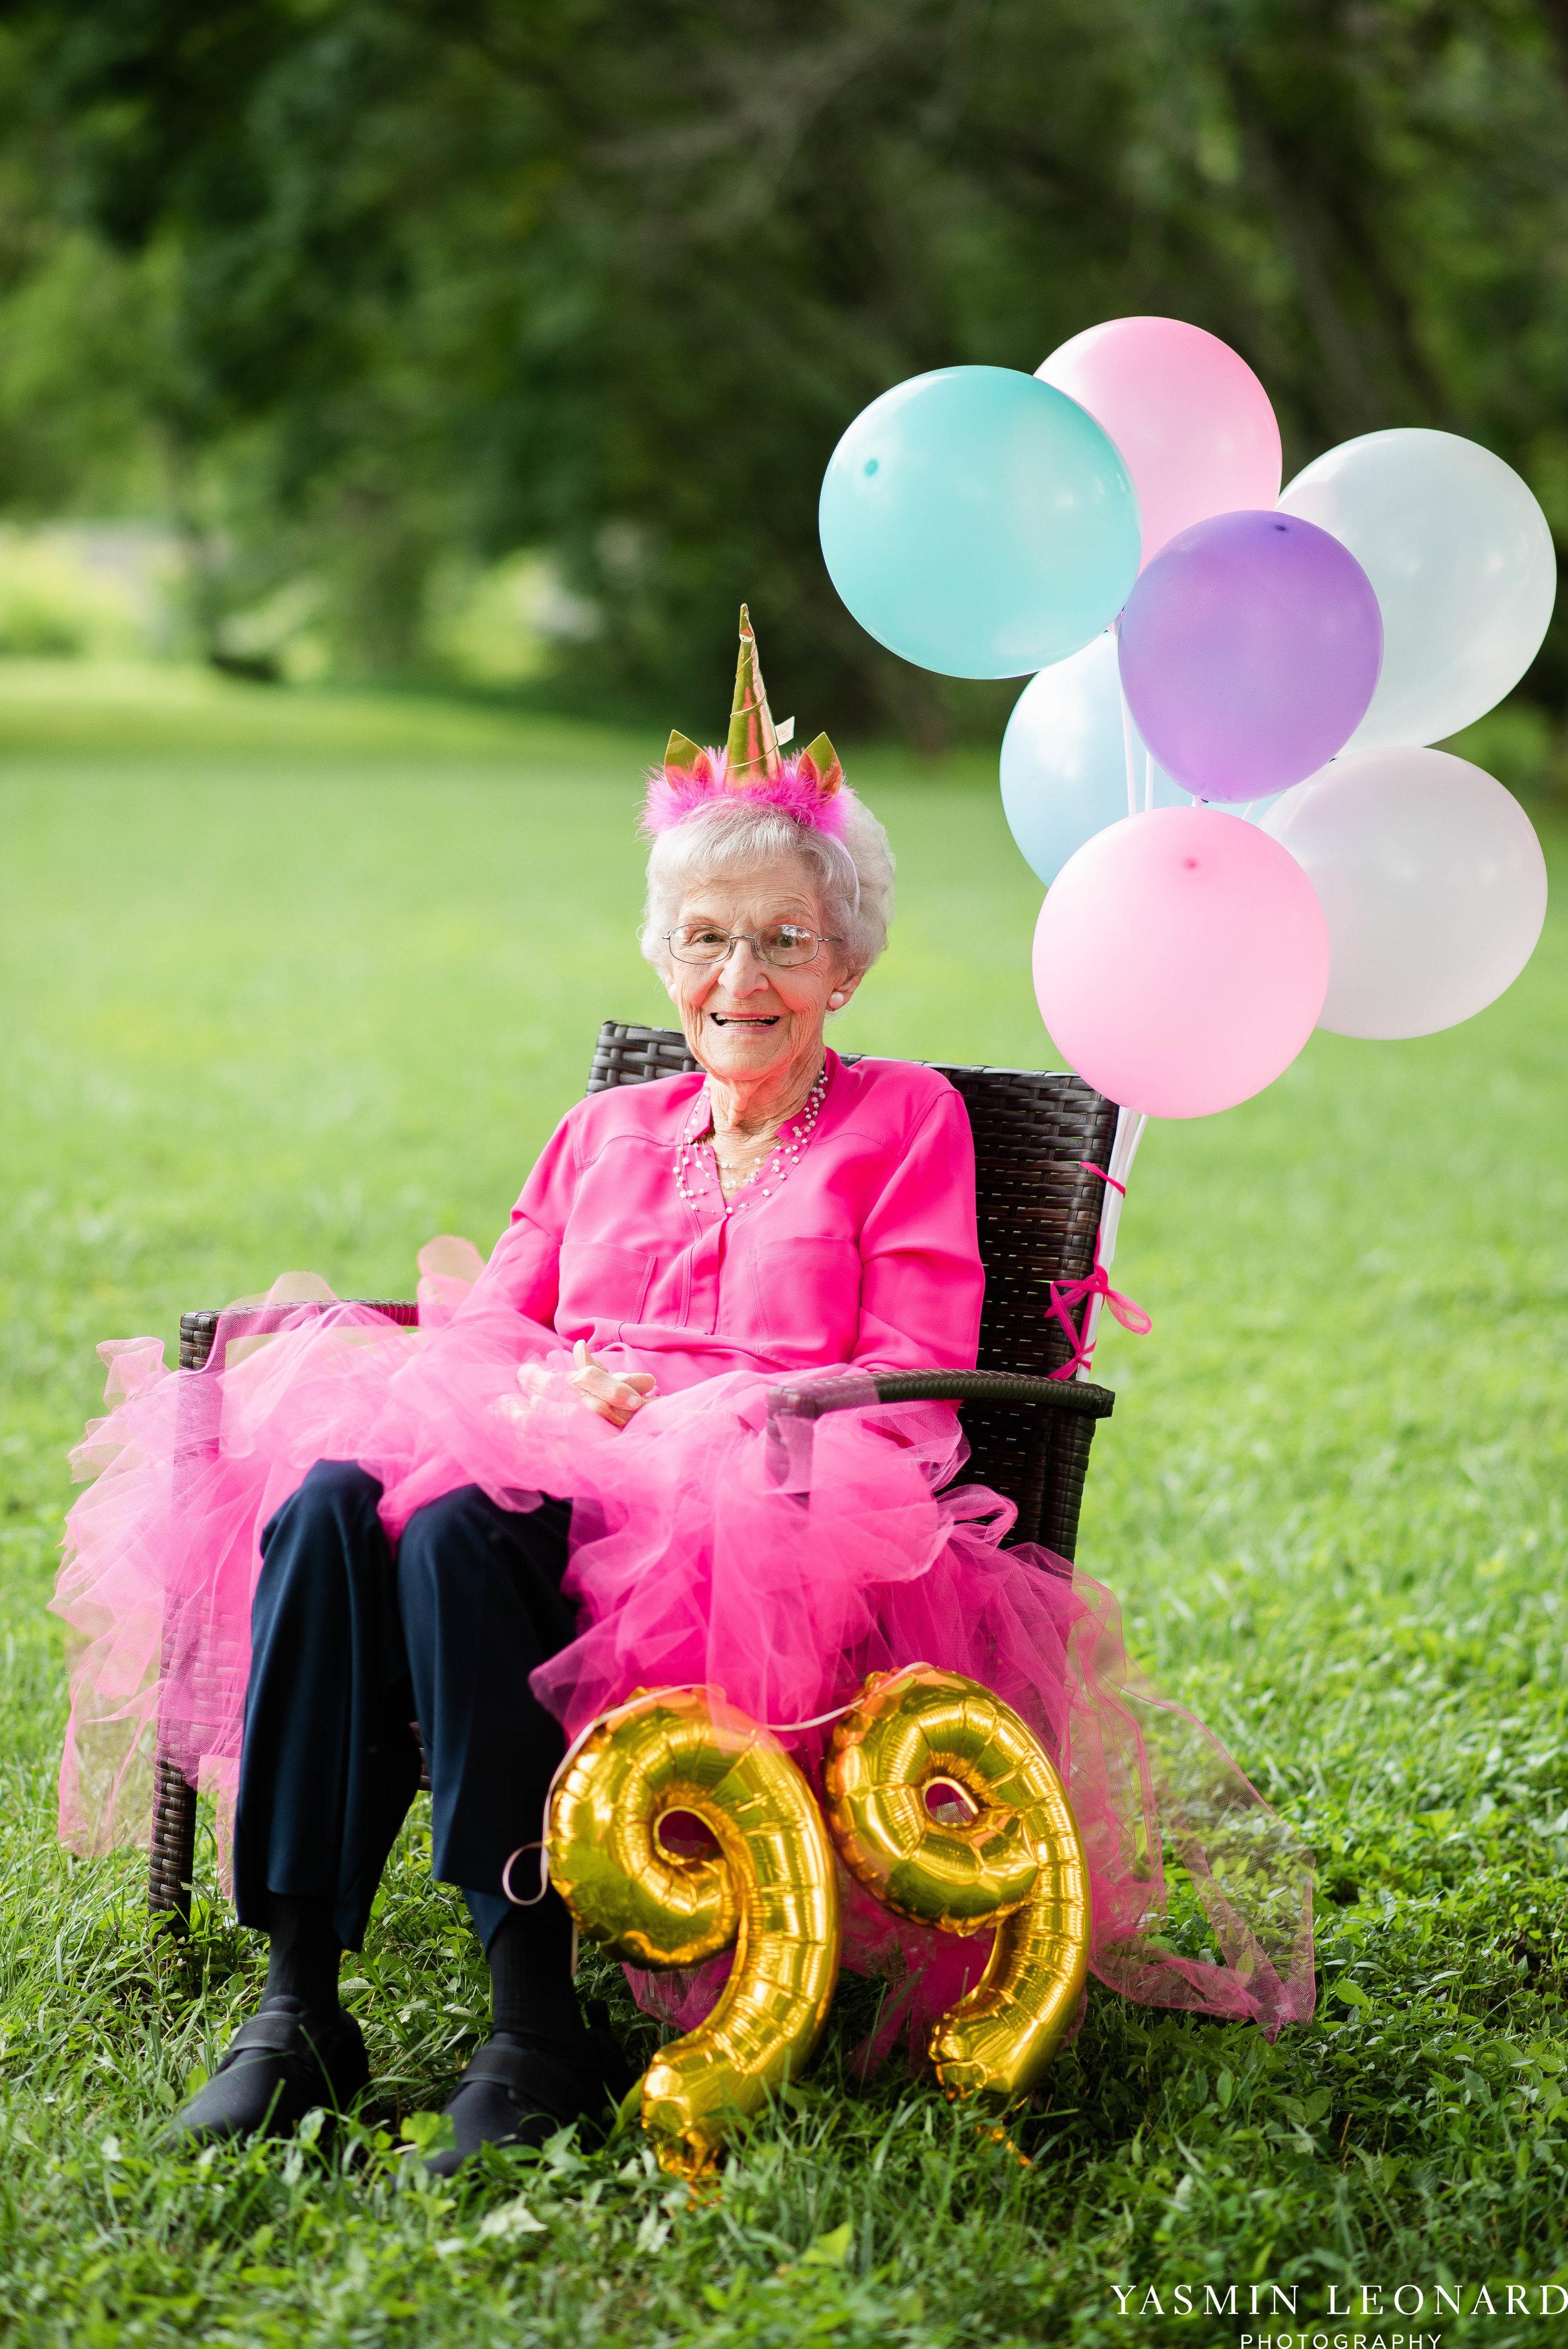 99 Year Old Birthday - Great Grandma Birthday Session - Grandma Birthday Session - 99 years Old - Adult Birthday Session - Four Generations-2.jpg